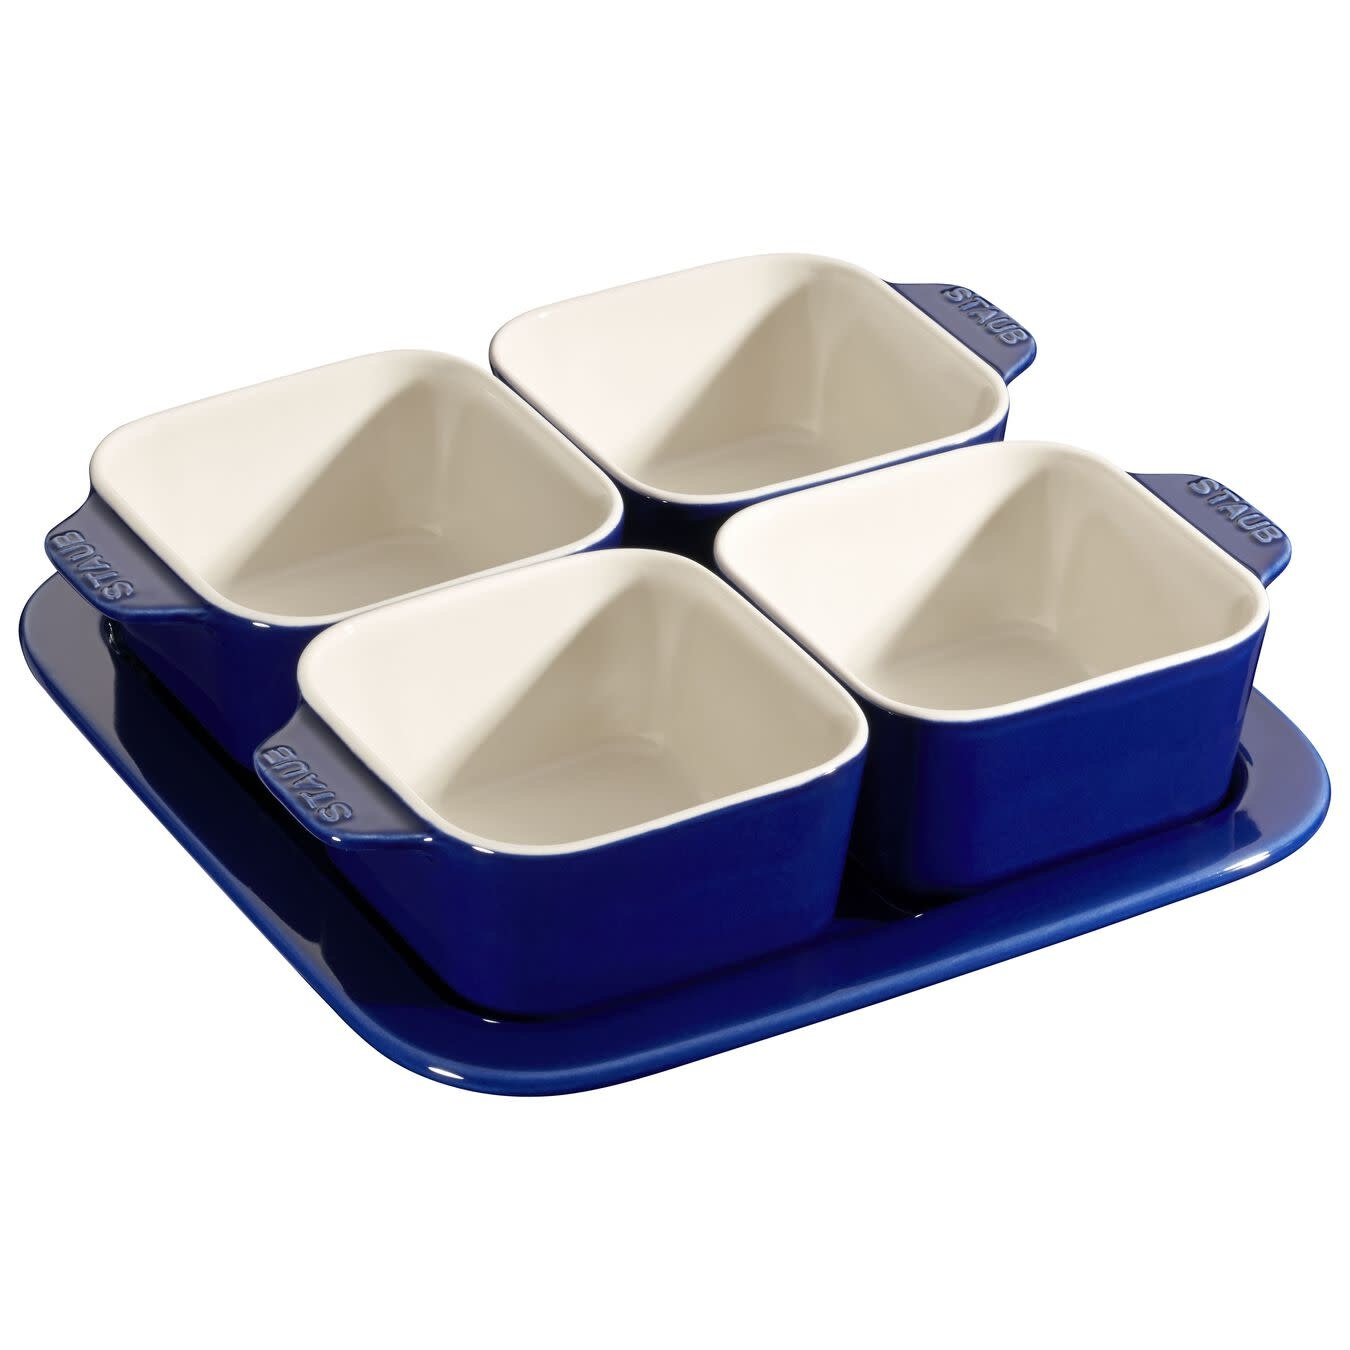 "Staub Appetizer Set - Blue 7.5"" x 7.5"" / 19cm x 19cm"